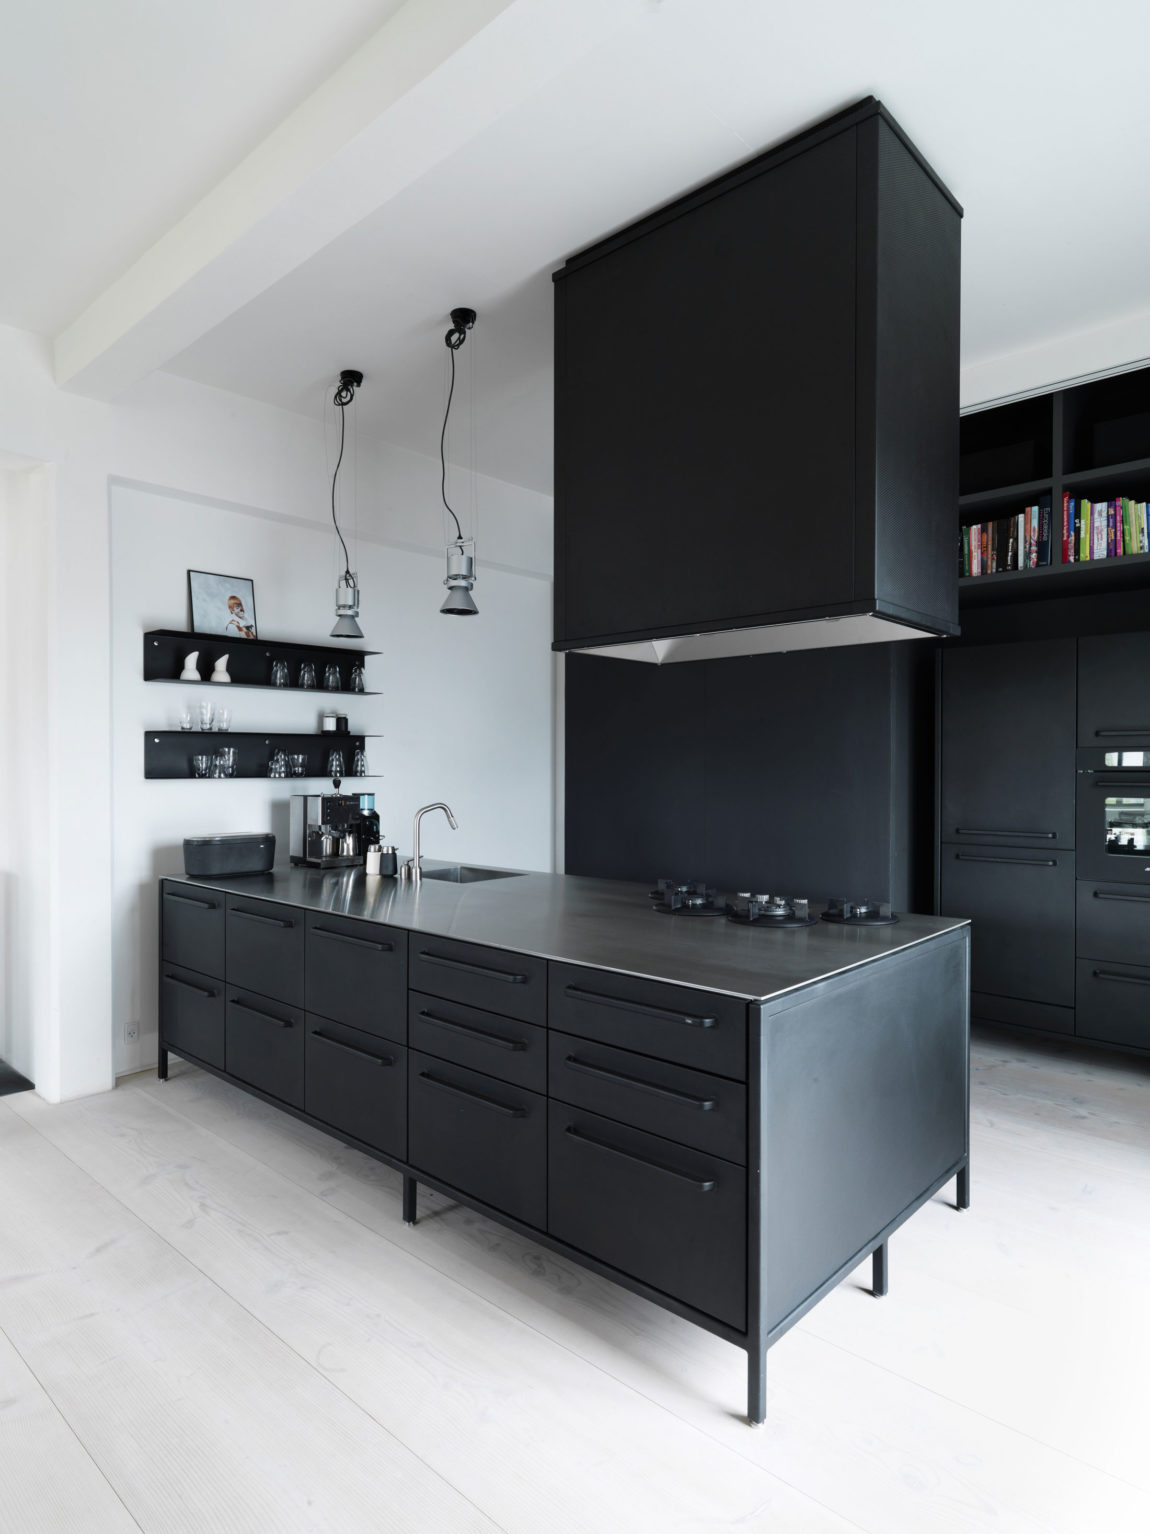 The Home of Morten Bo Jensen by Vipp (6)